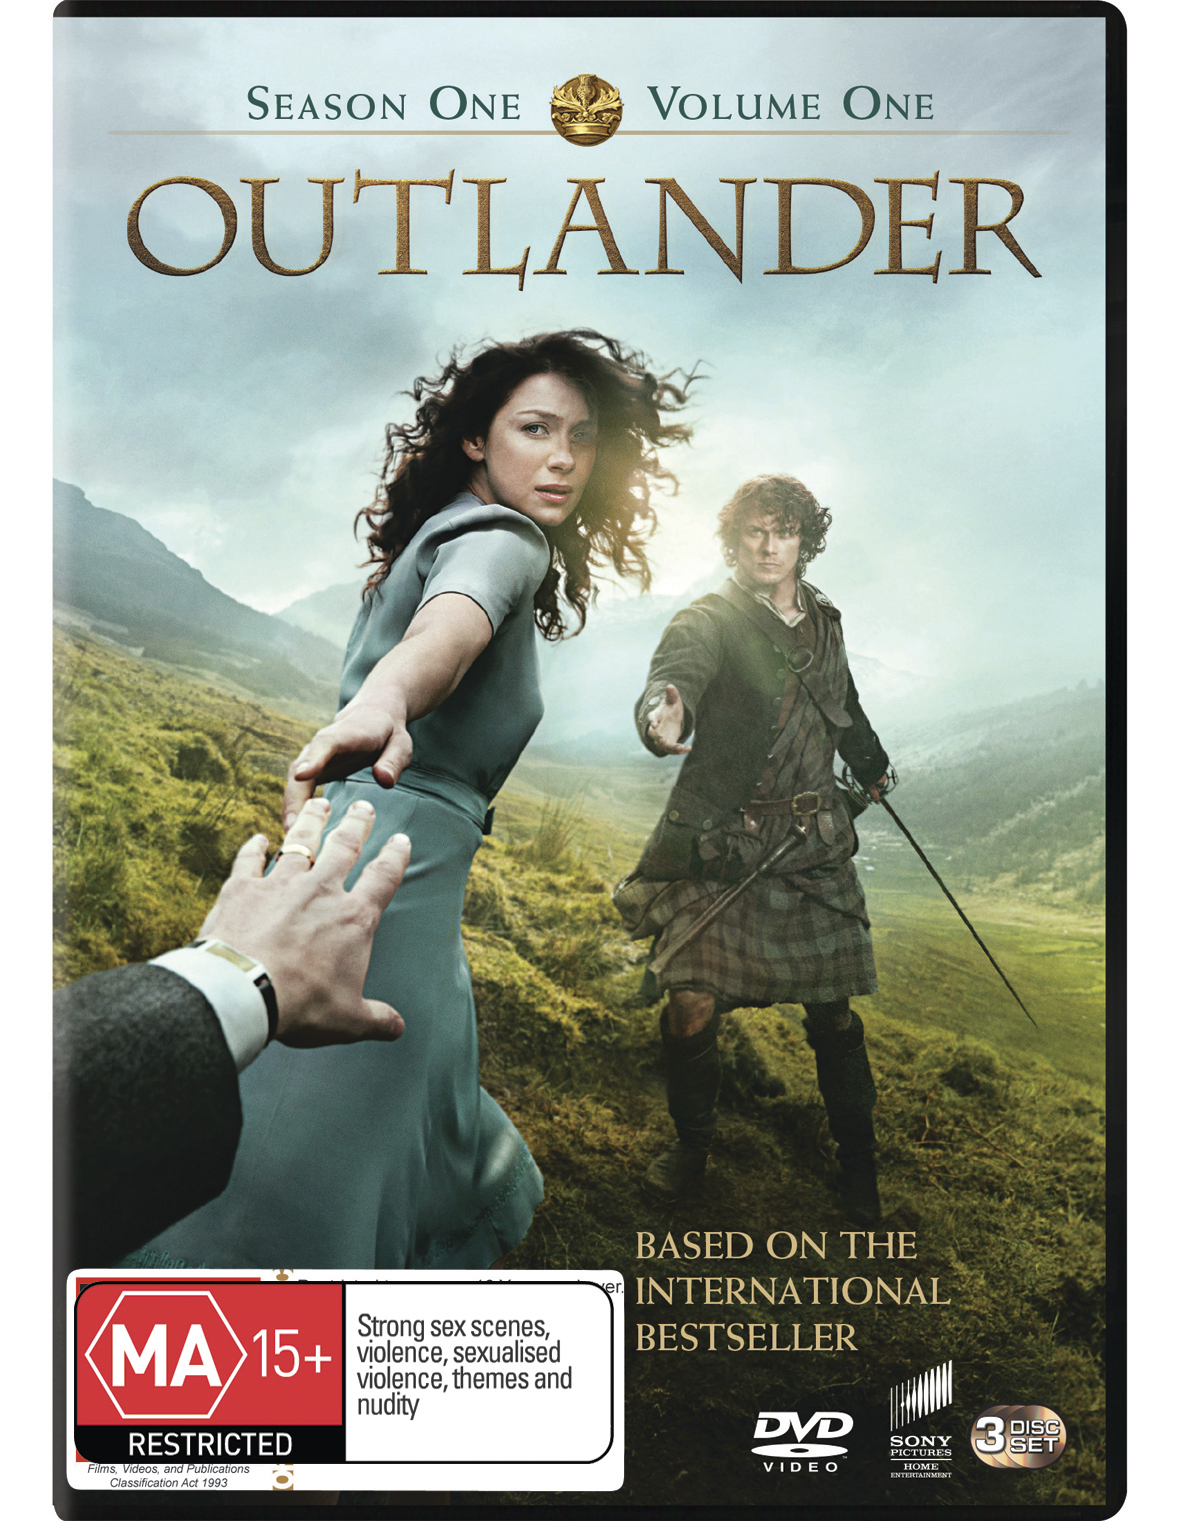 Outlander - Season 1: Volume 1 on DVD image